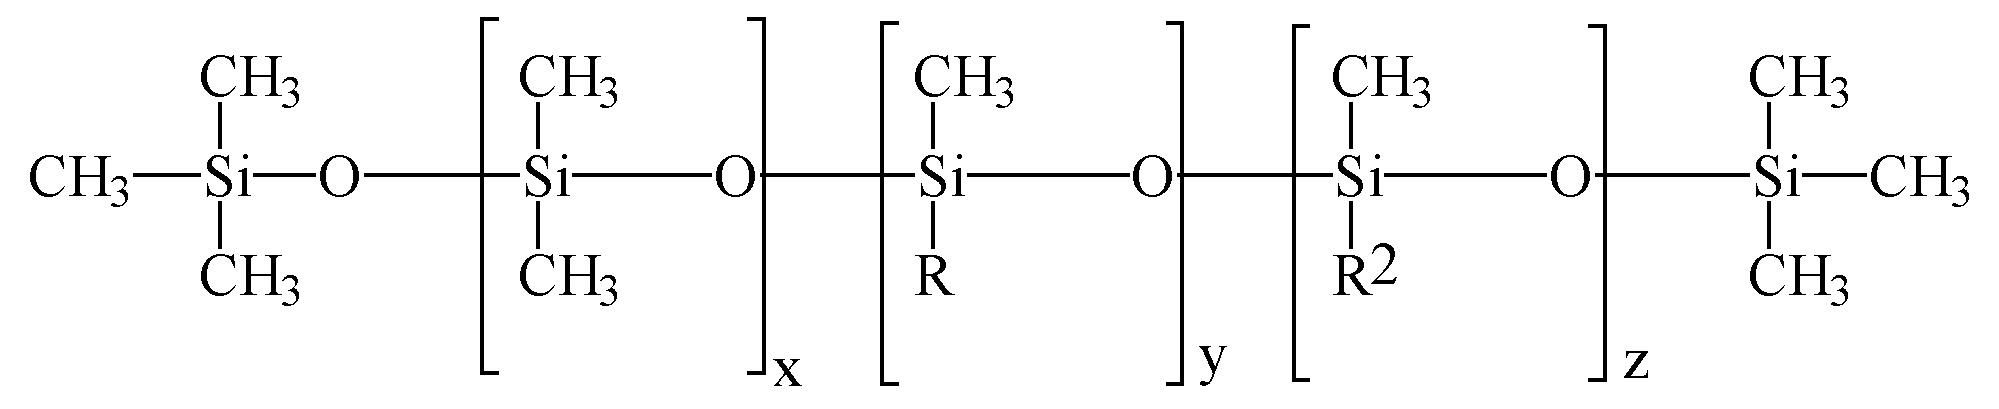 Figure 112005048633519-pct00003